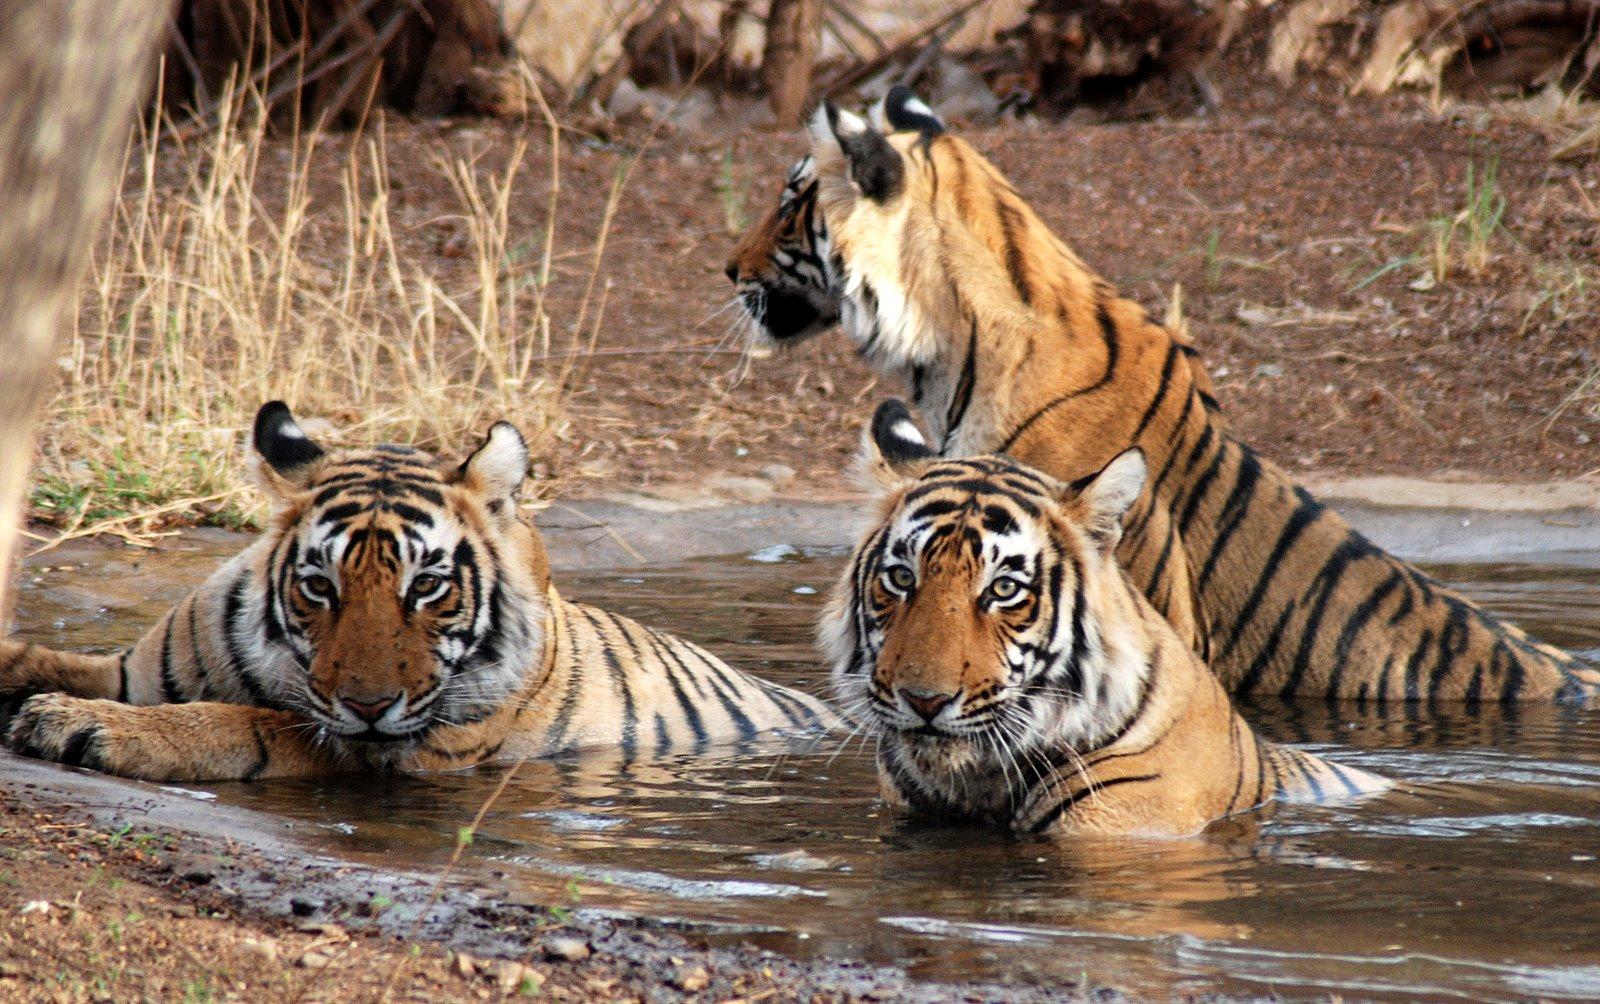 Tigers-in-ranthambore-India-Wildlife